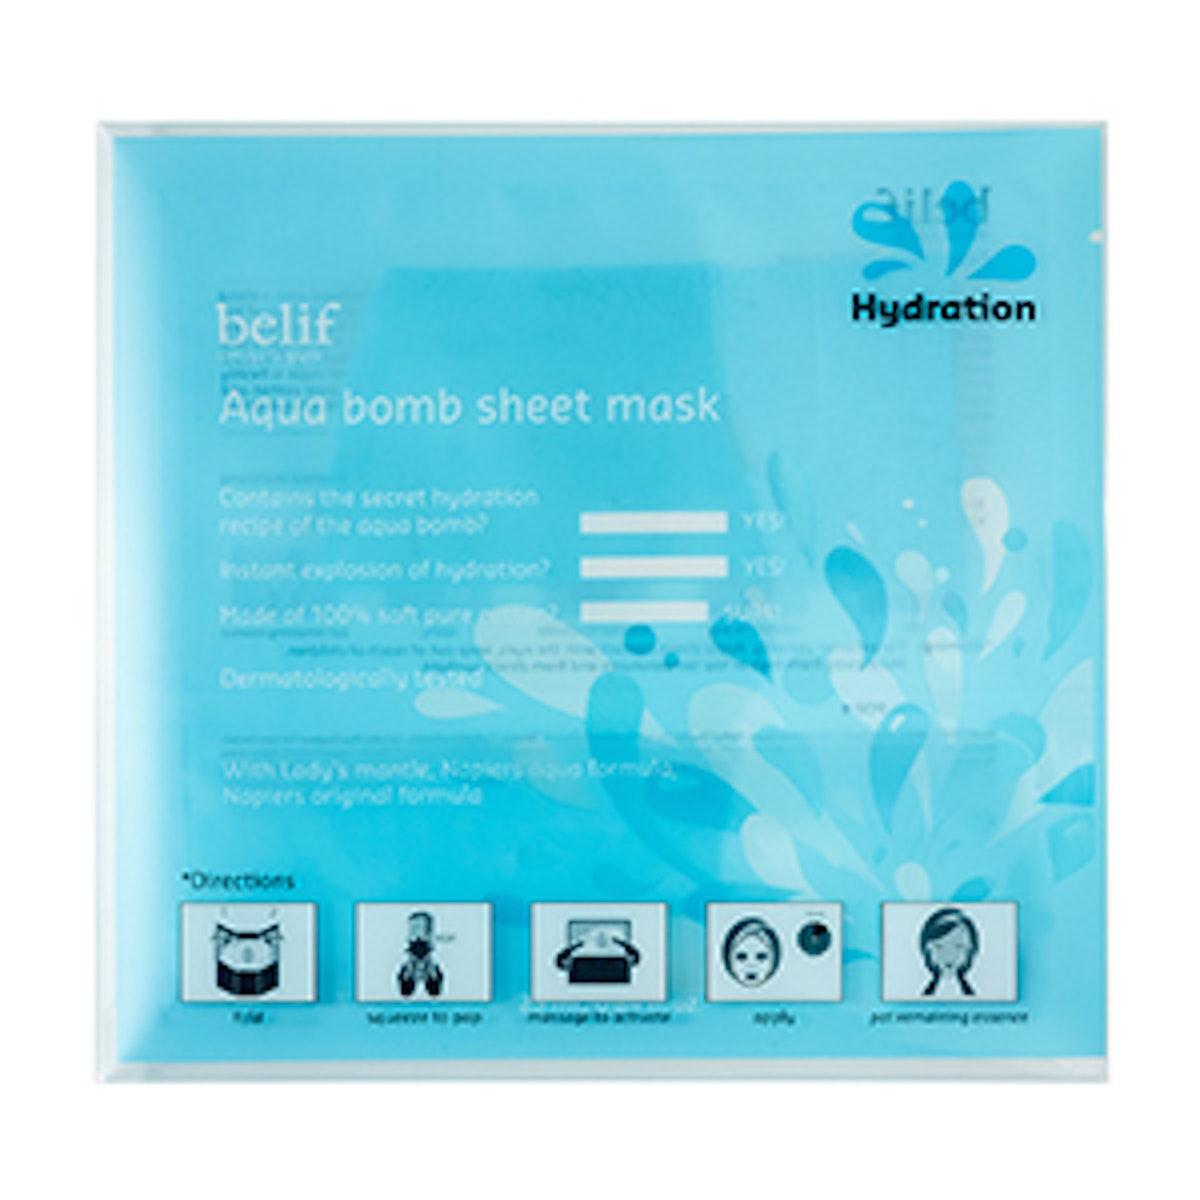 Aqua Bomb Sheet Mask